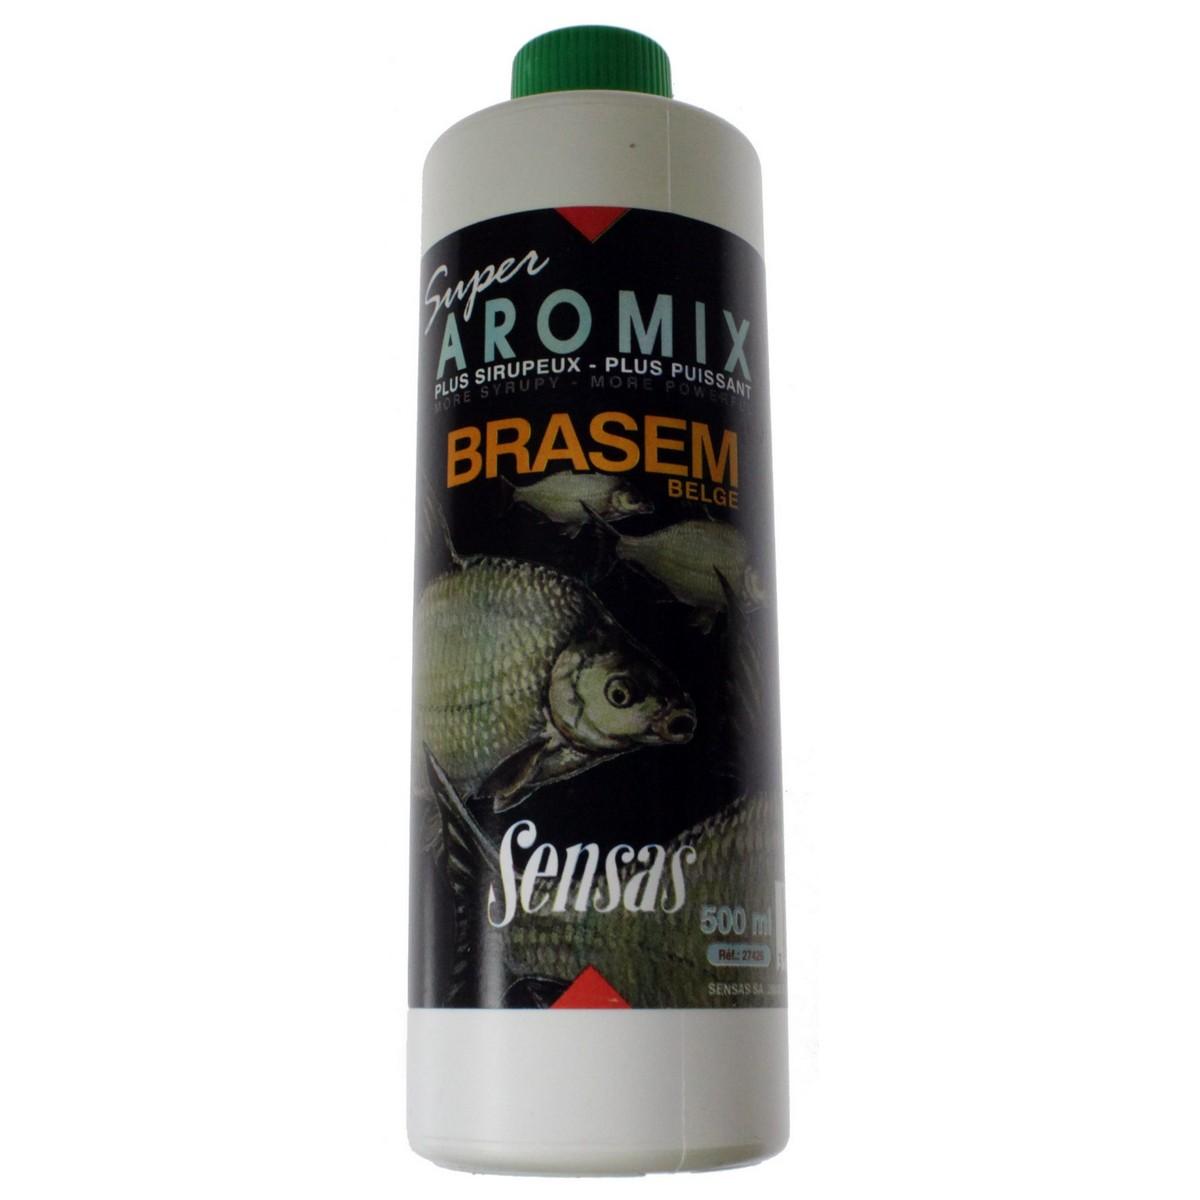 Течен ароматизатор Sensas Super Aromix Brasem Belge